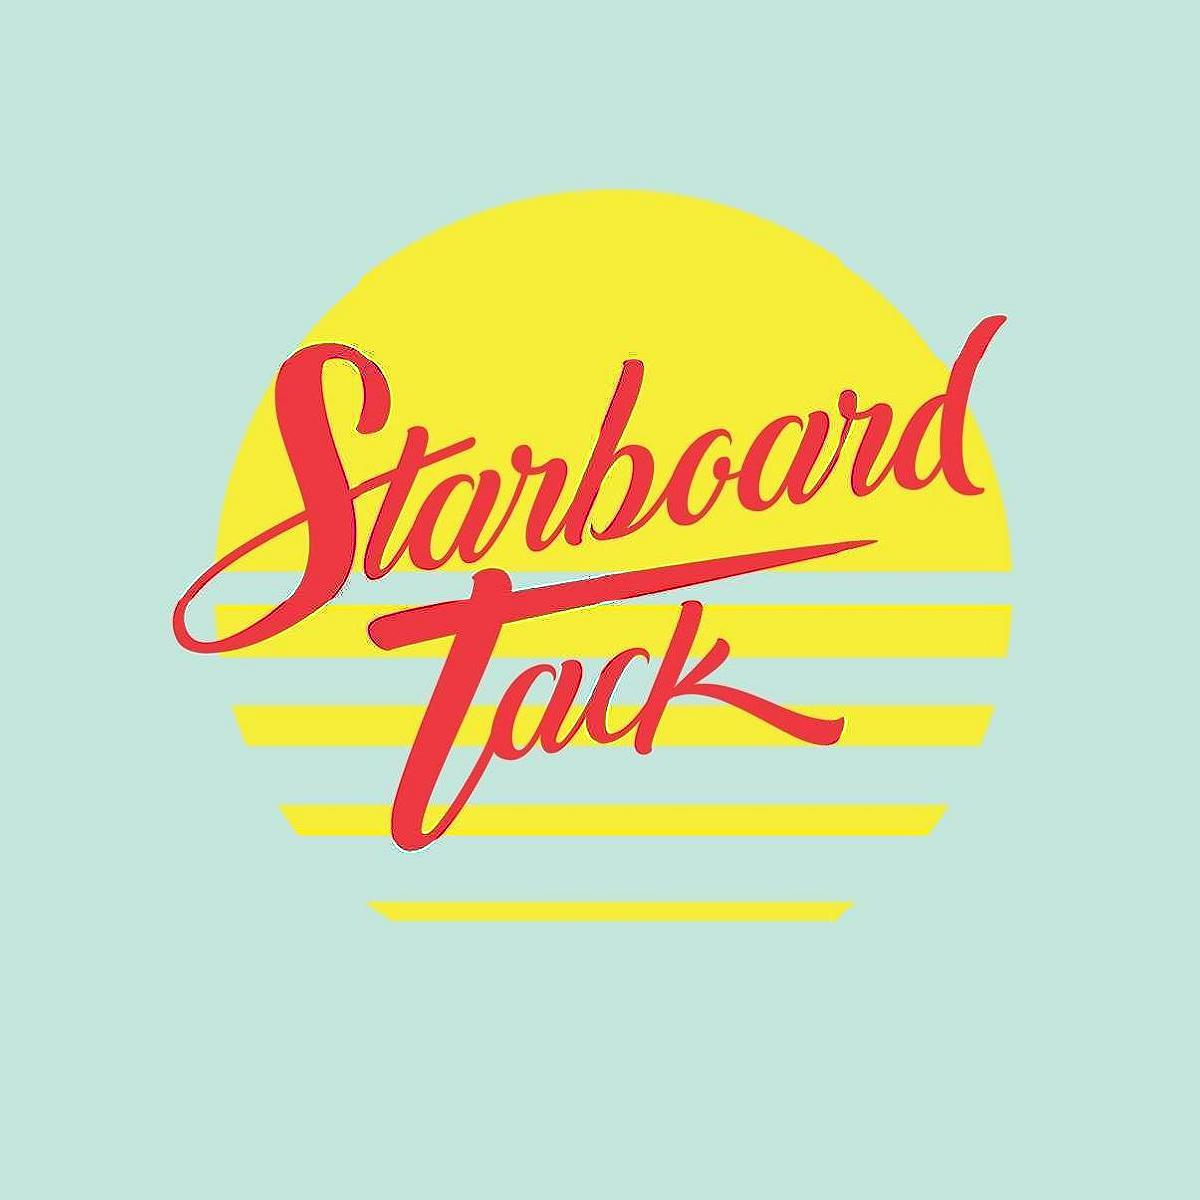 Starboard Tack Logo